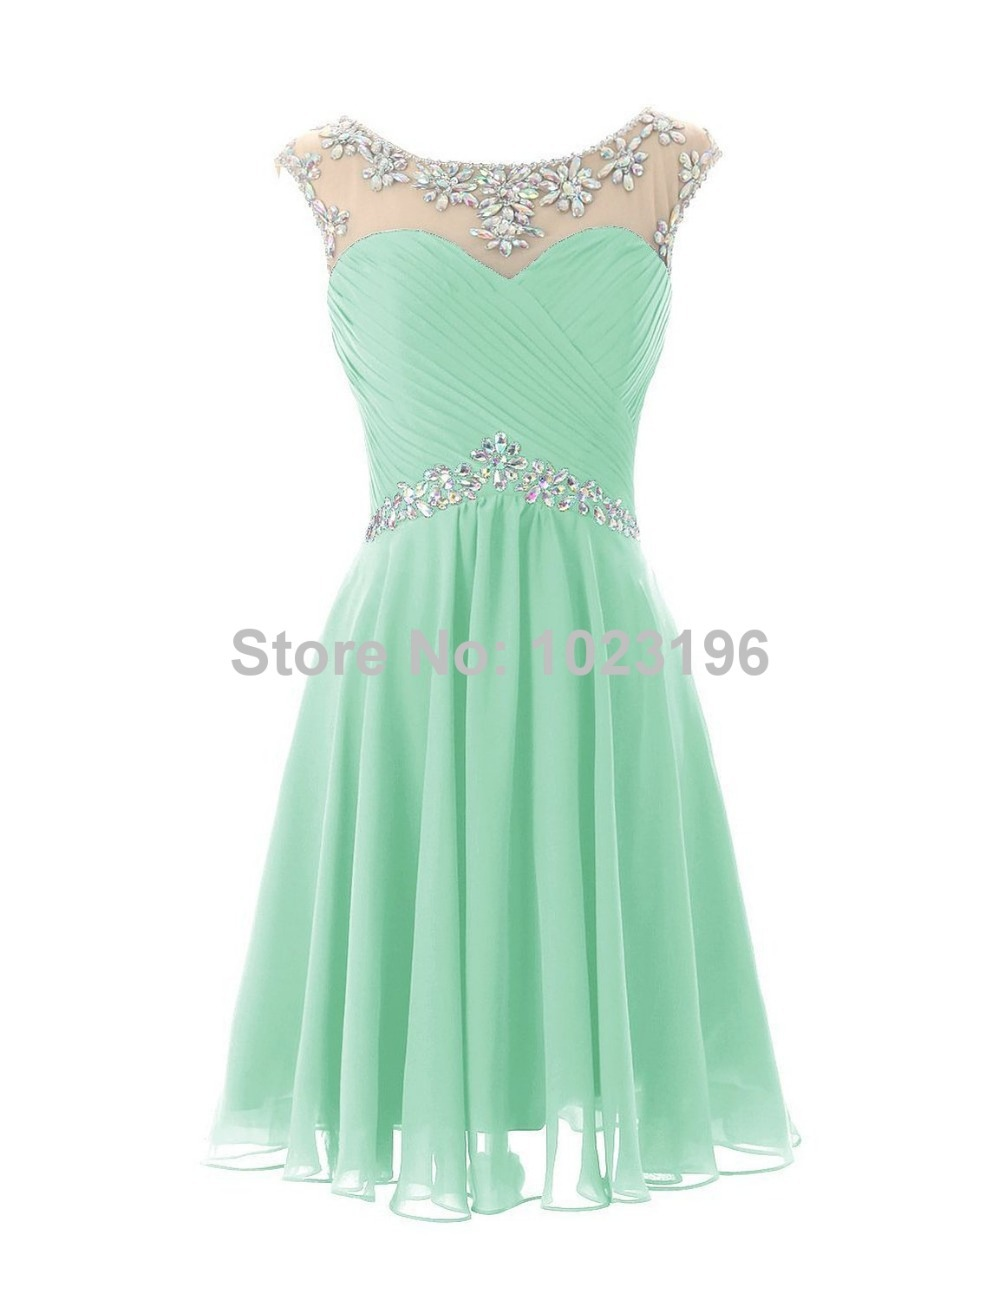 Colorful Prom Dresses At Target Illustration - All Wedding Dresses ...